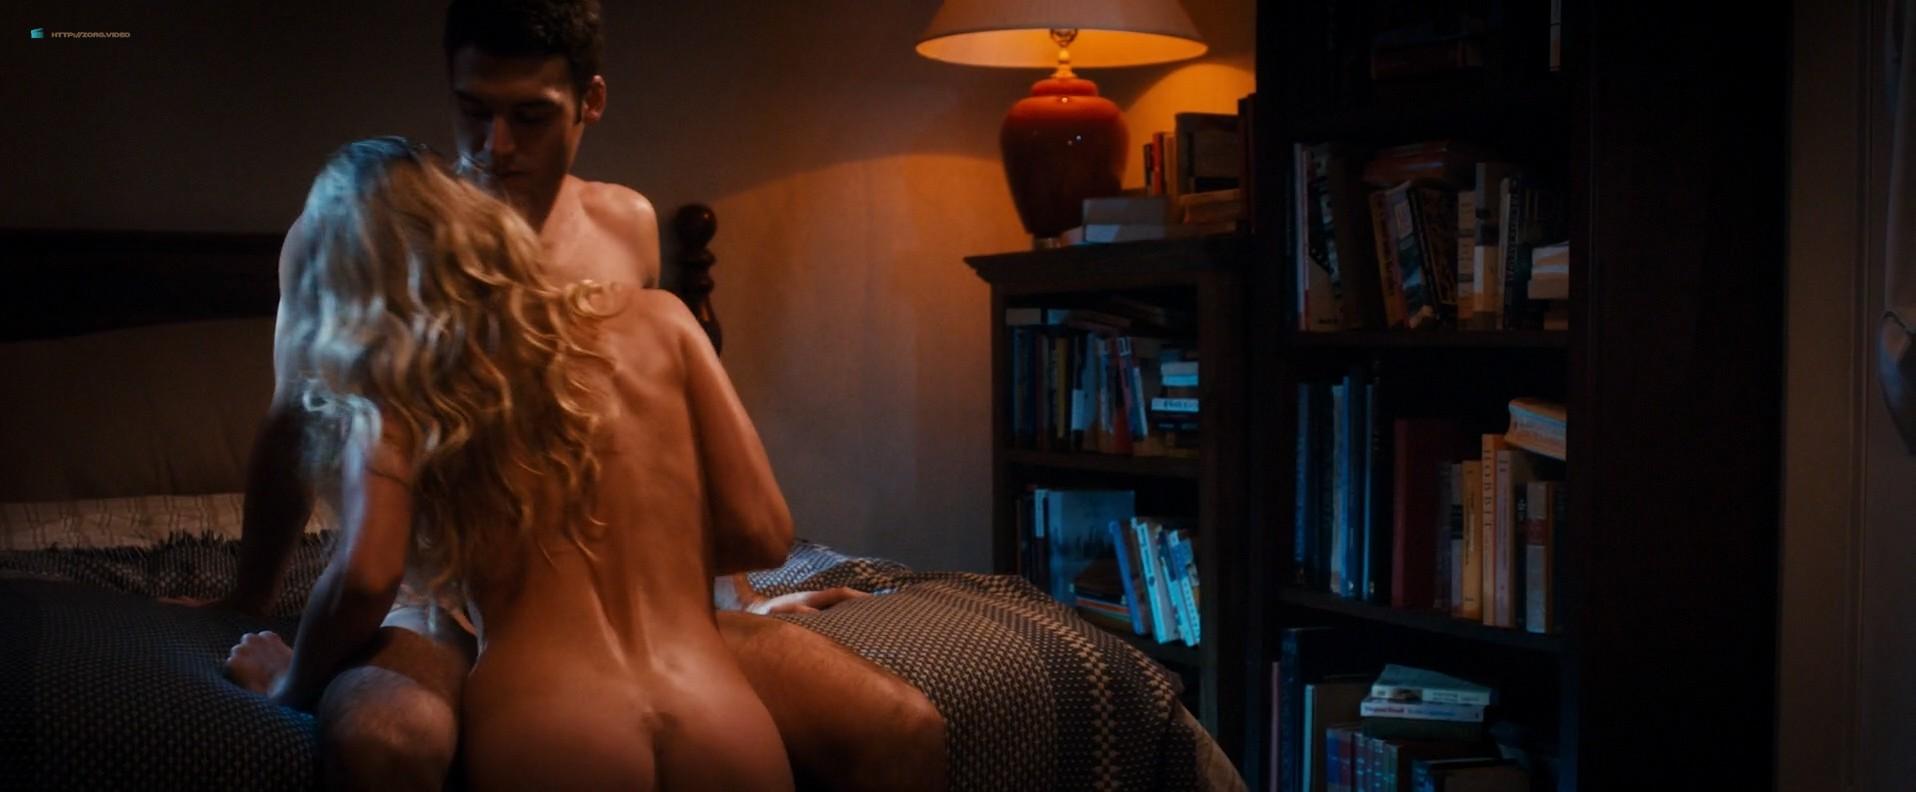 Jennifer Lopez hot sex scene and Lexi Atkins nude sex - The Boy Next Door (2015) HD 1080p (3)